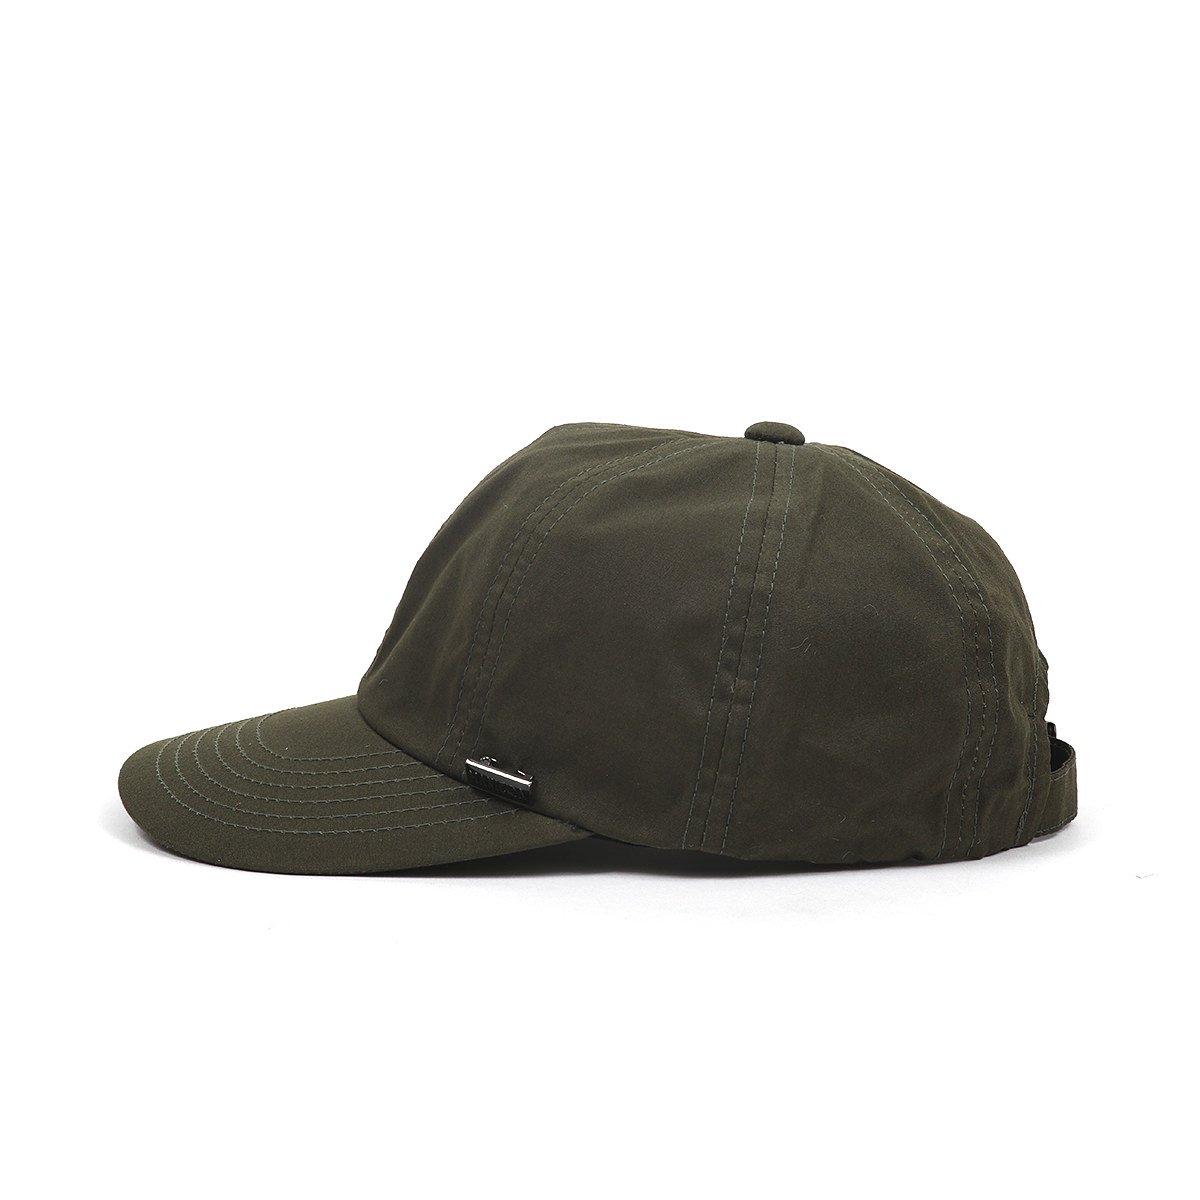 PRAFFIN CAP 詳細画像3